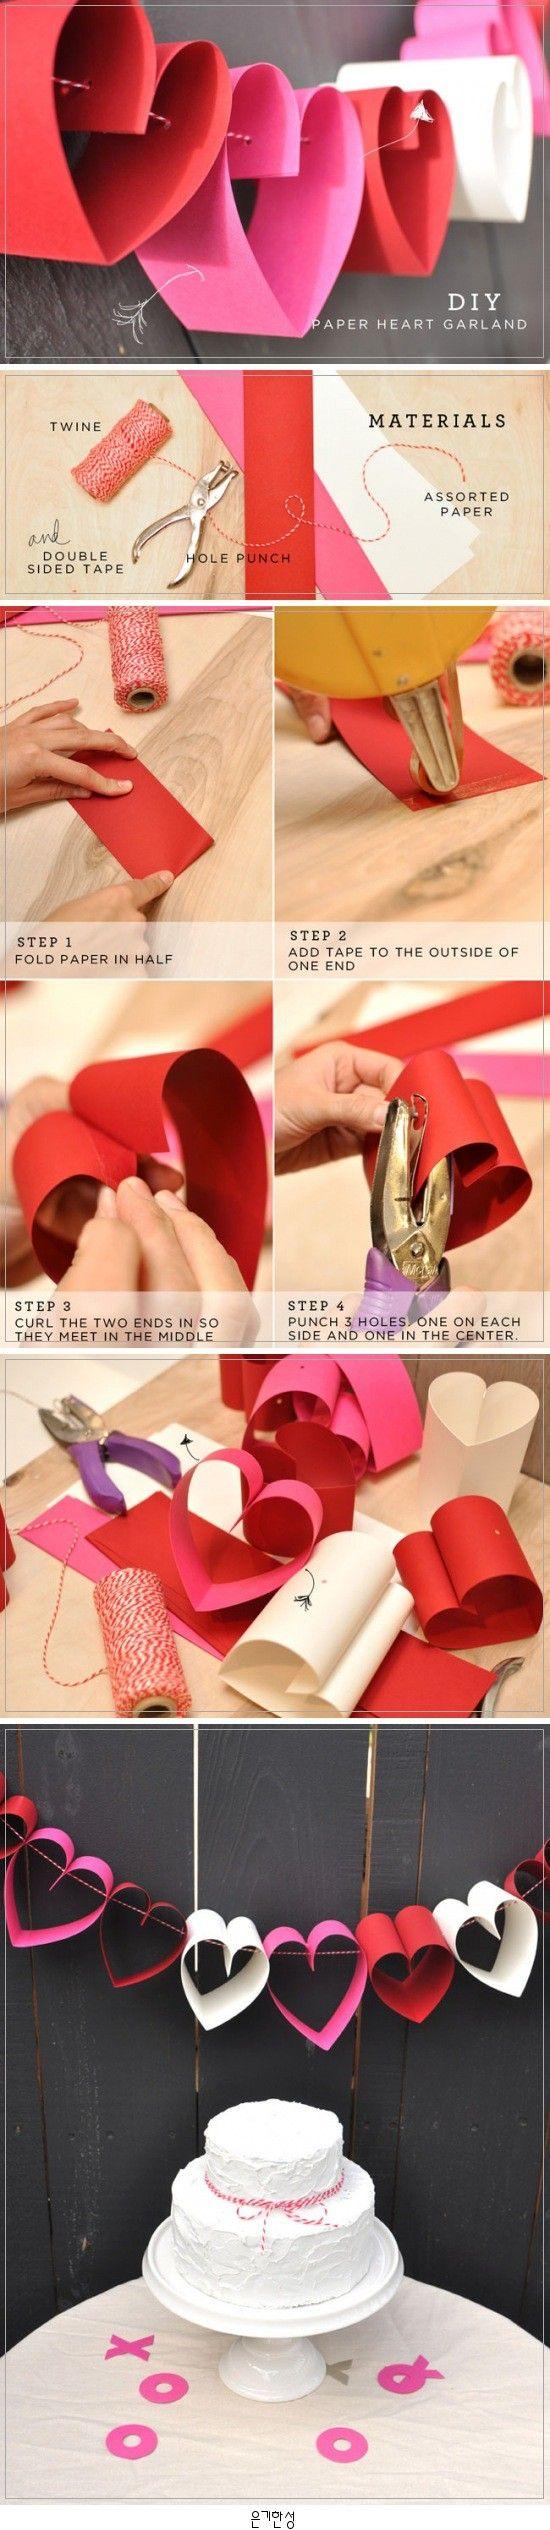 Paper Heart Garland 하트 색종이 플랜카드